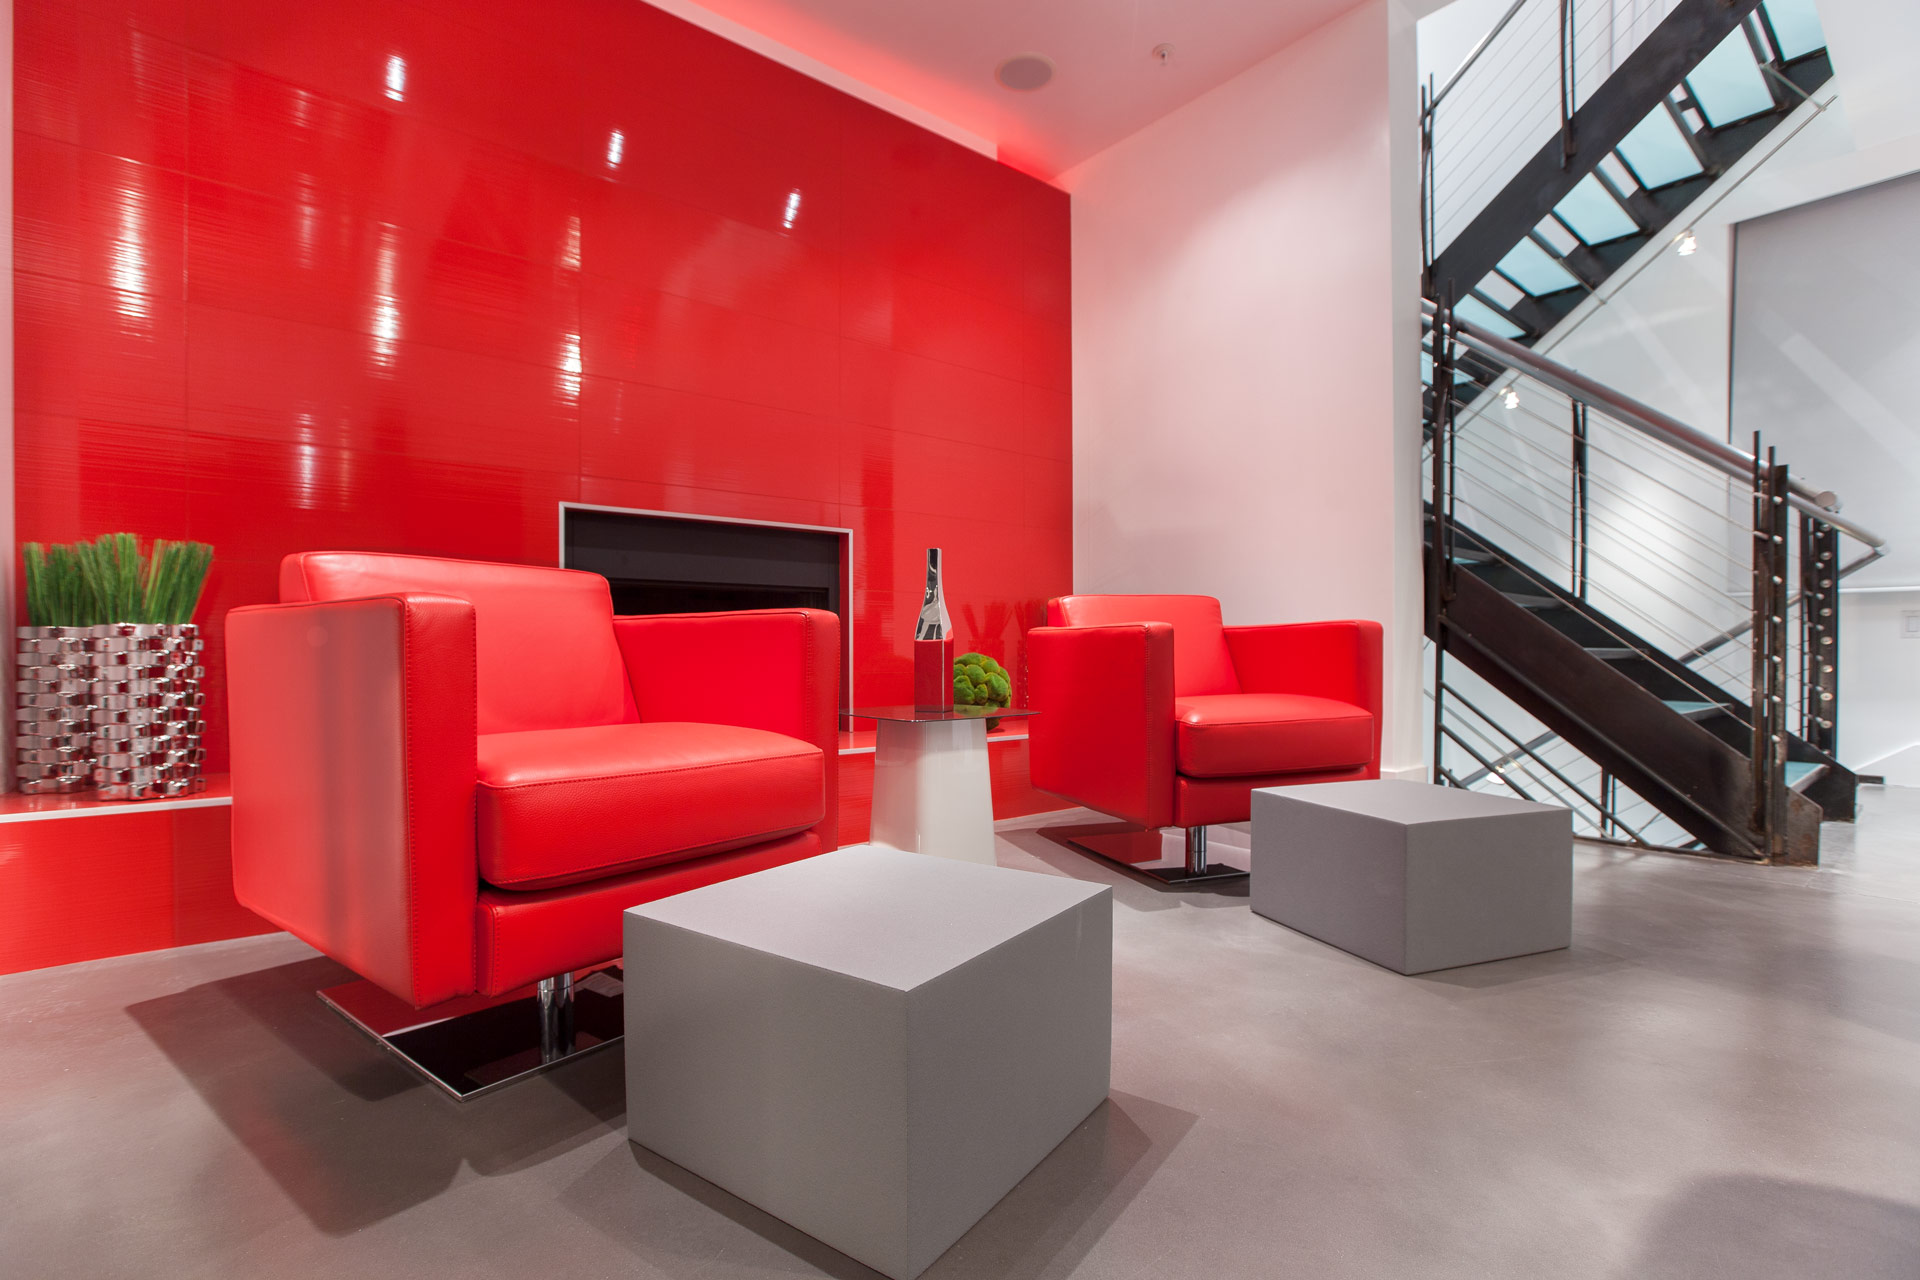 Residential-Interiors-13